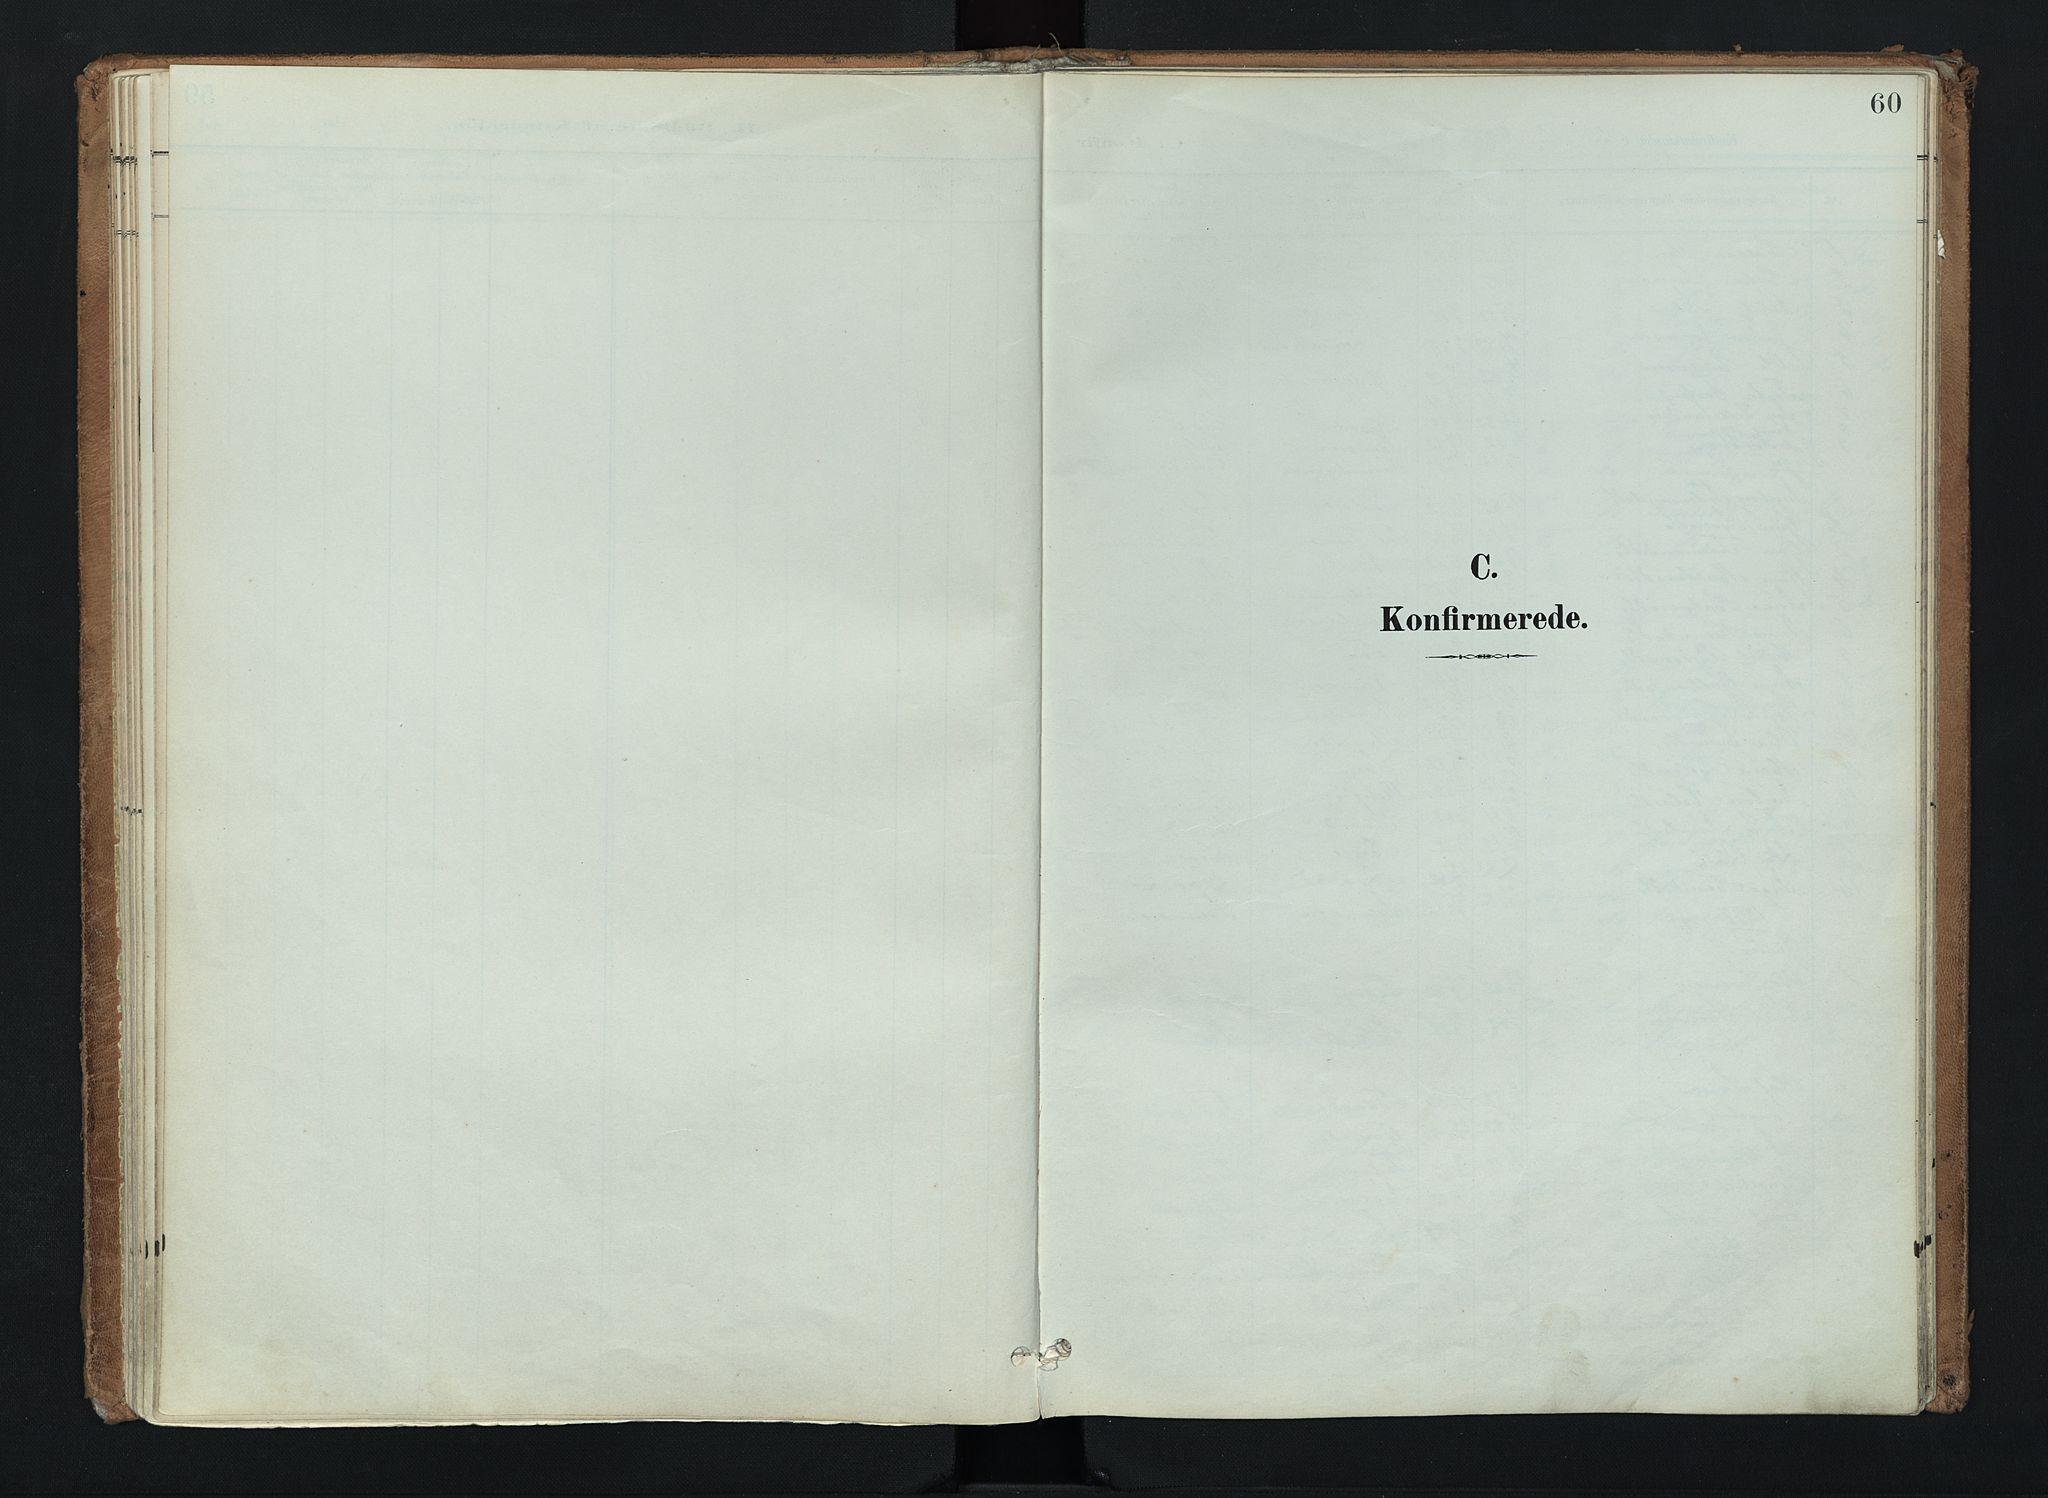 SAH, Nord-Aurdal prestekontor, Ministerialbok nr. 16, 1897-1925, s. 60